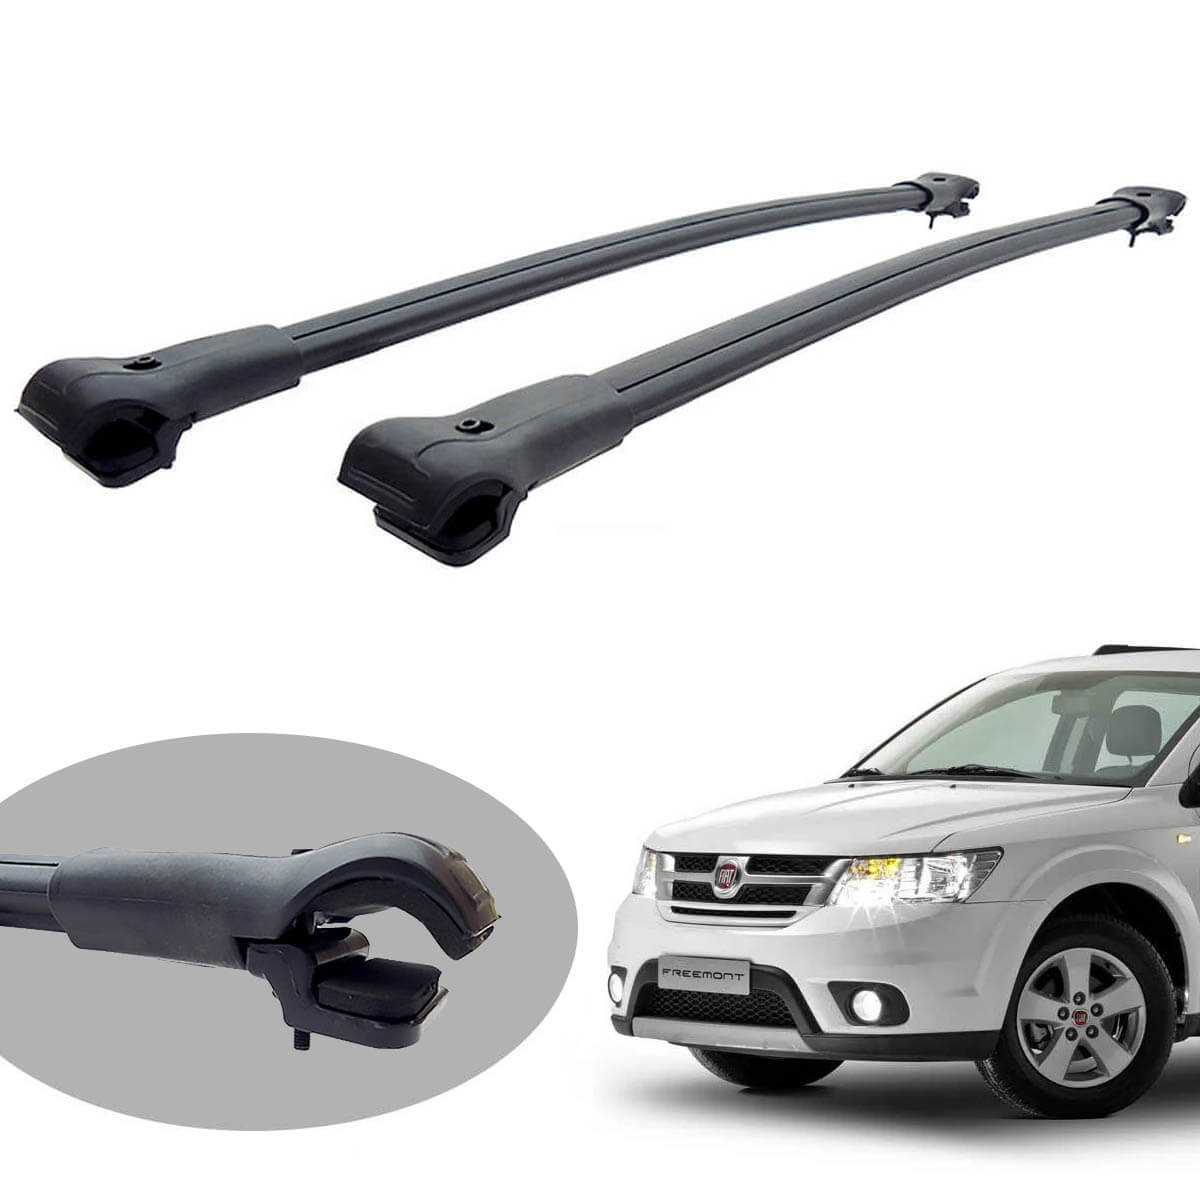 Travessa rack de teto larga preta alumínio Freemont 2012 a 2016 ou Dodge Journey 2010 a 2018